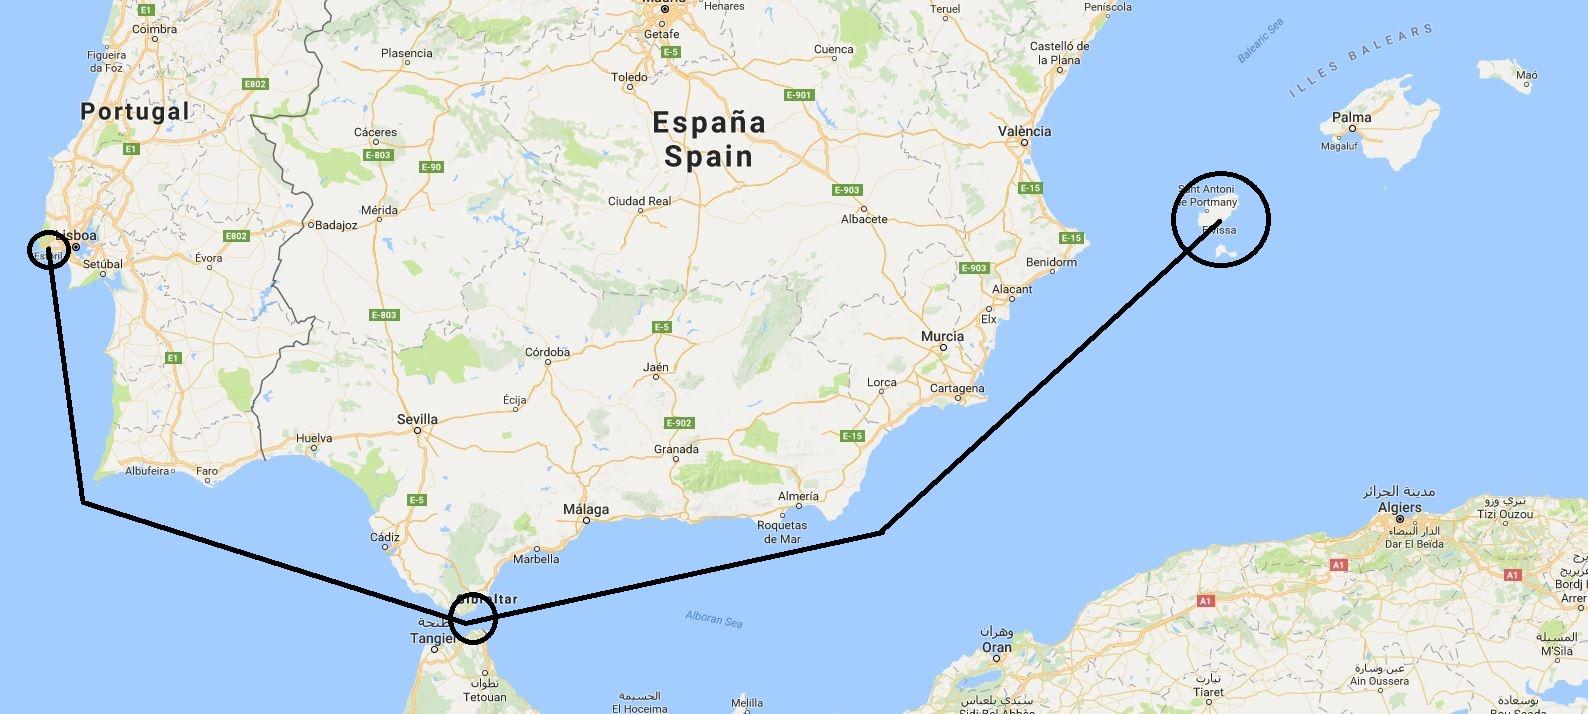 Daedalus Adventure - mapa (Gibraltar Ibica)